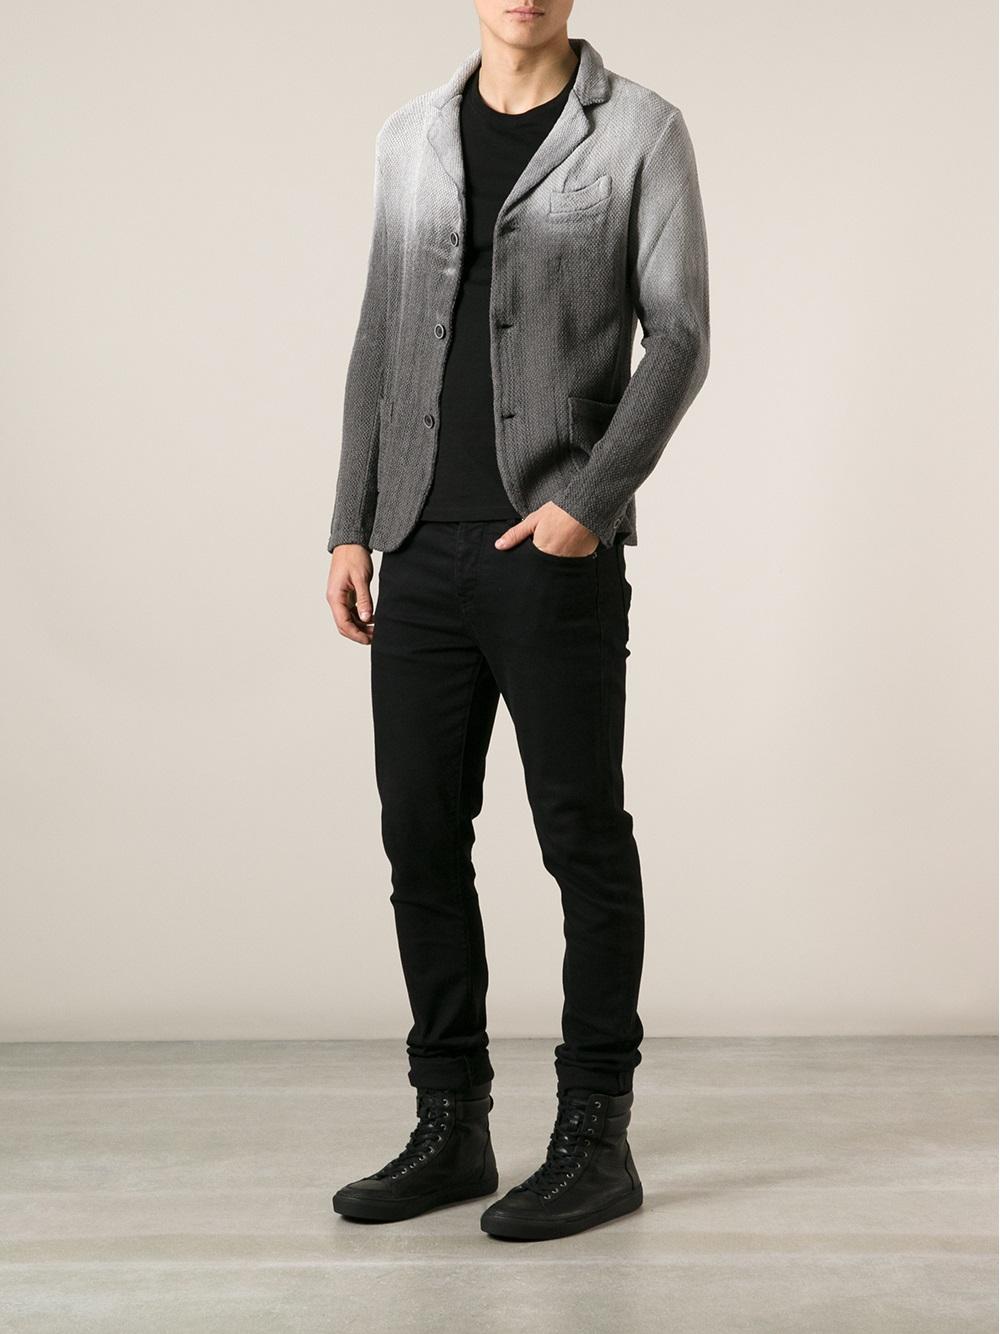 Lyst Avant Toi Faded Blazer In Gray For Men